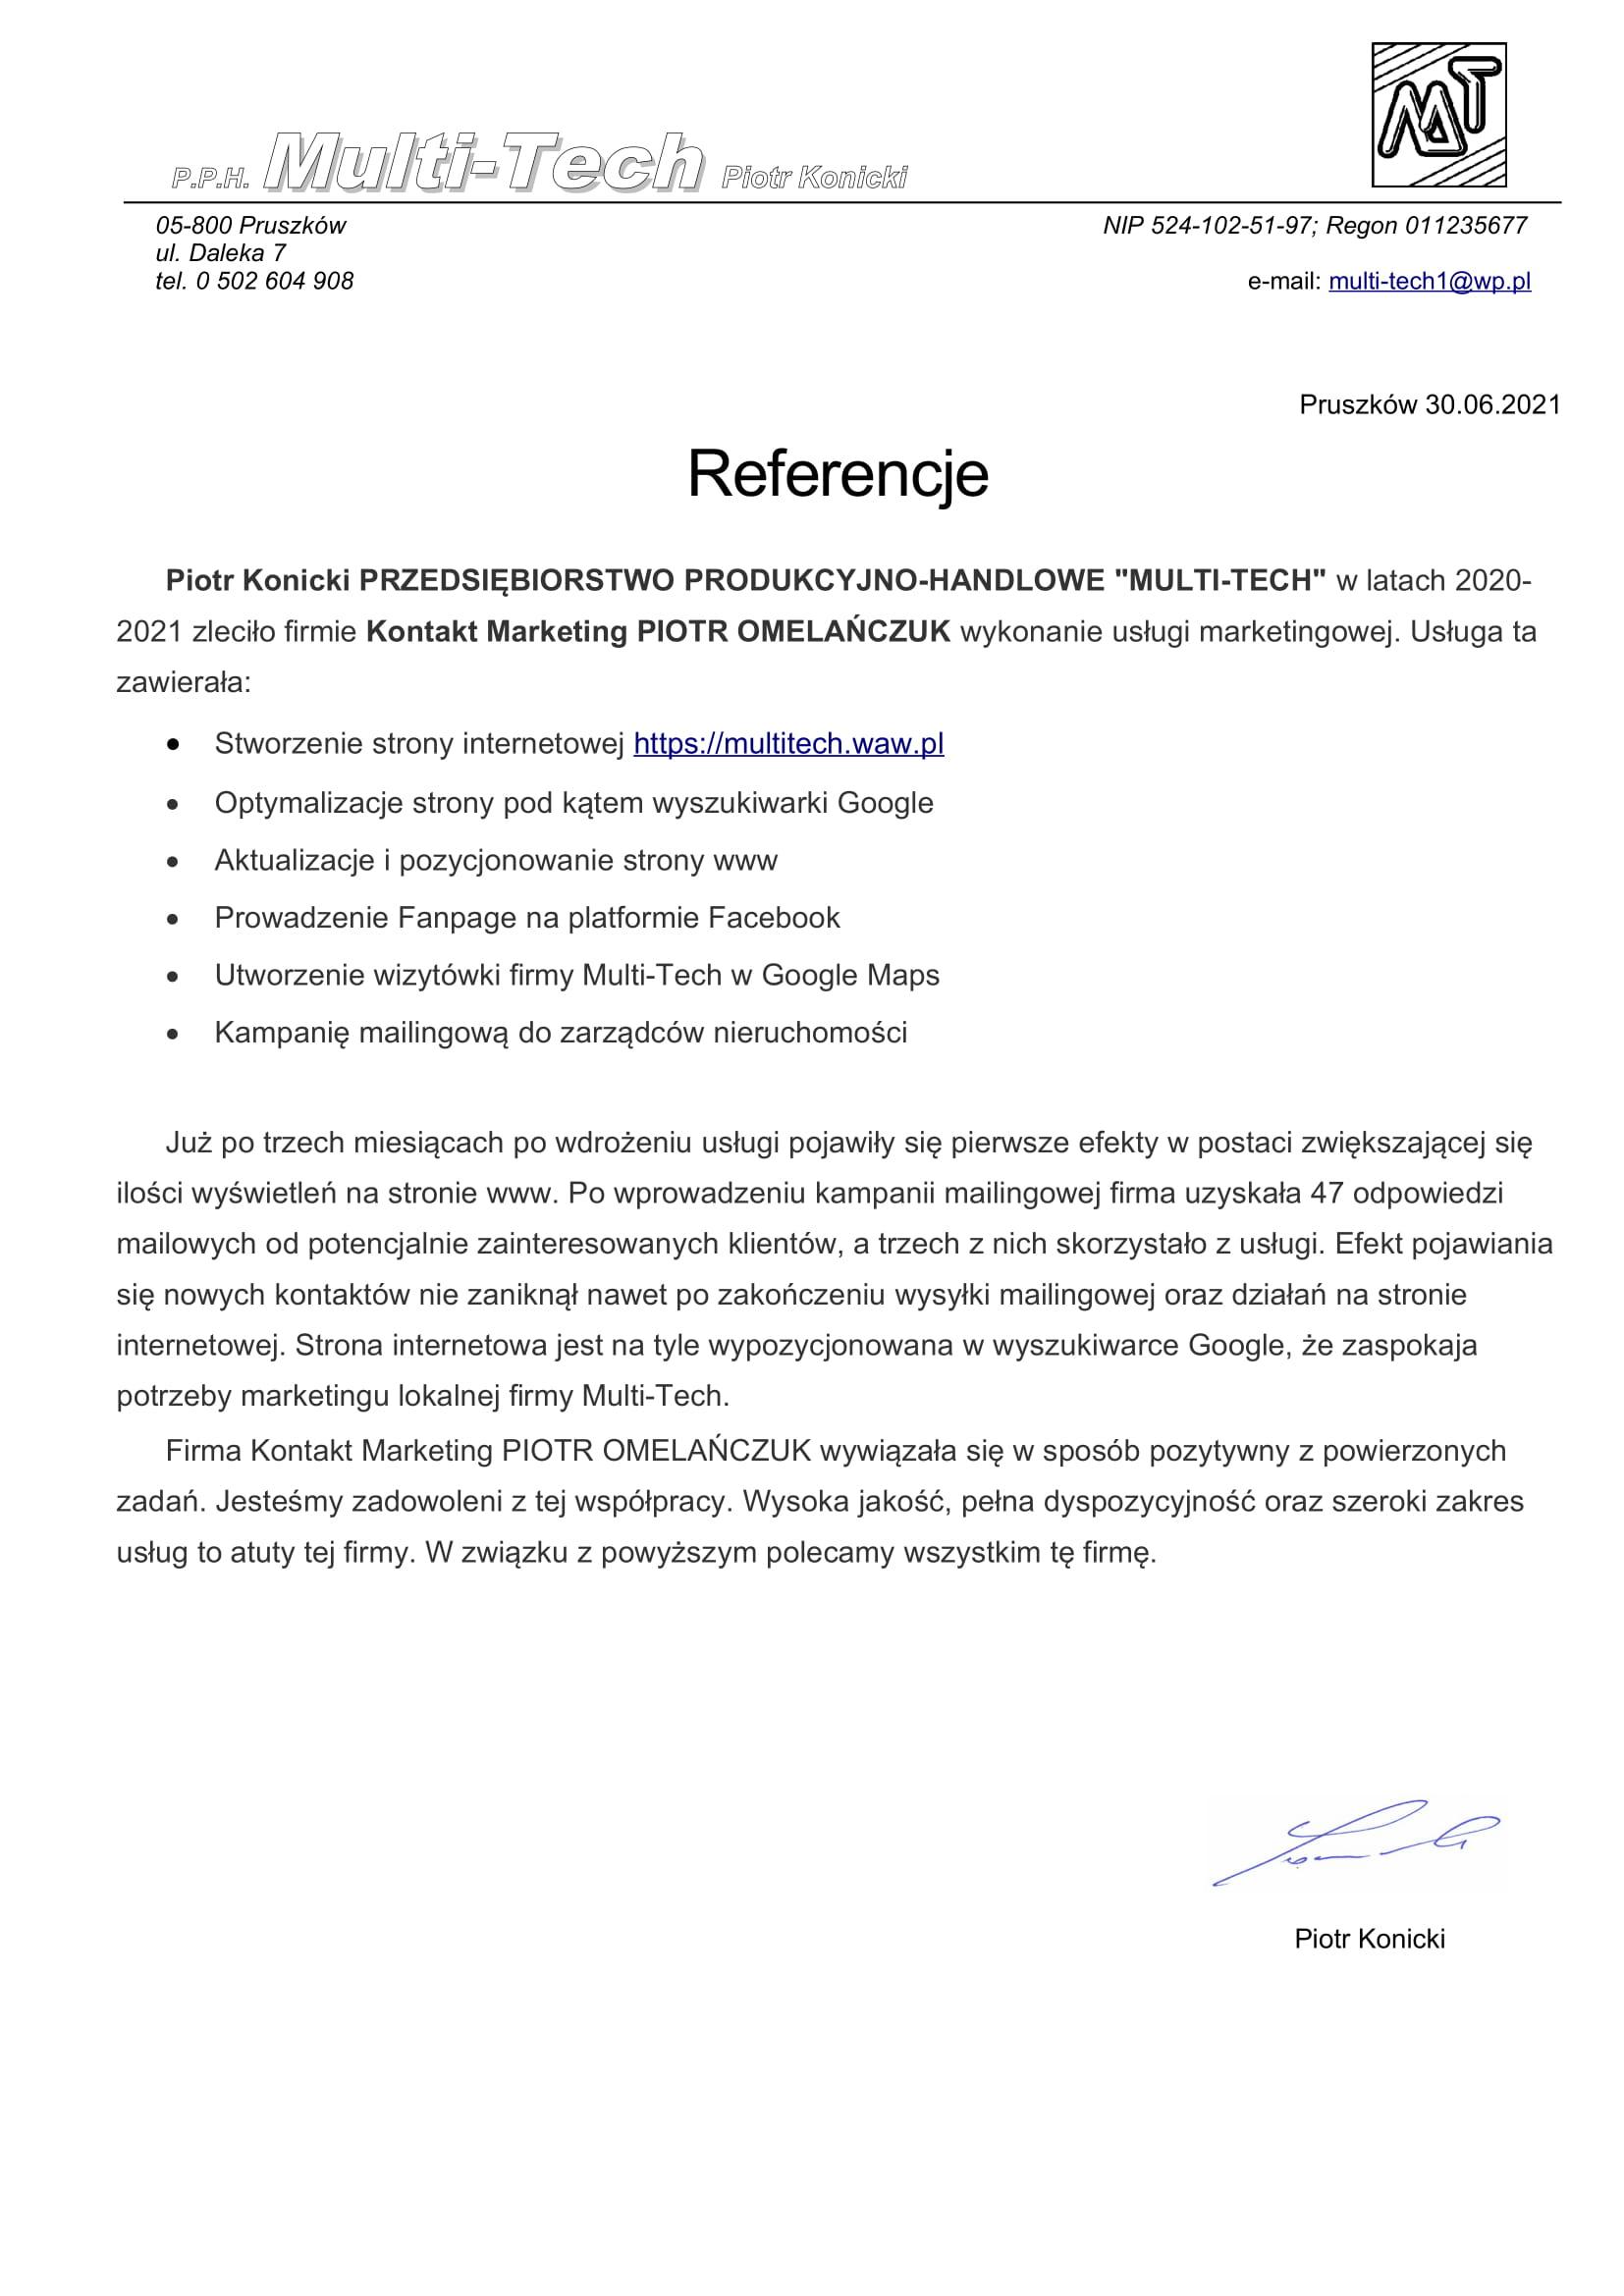 Referencje Klienta Multi-Tech